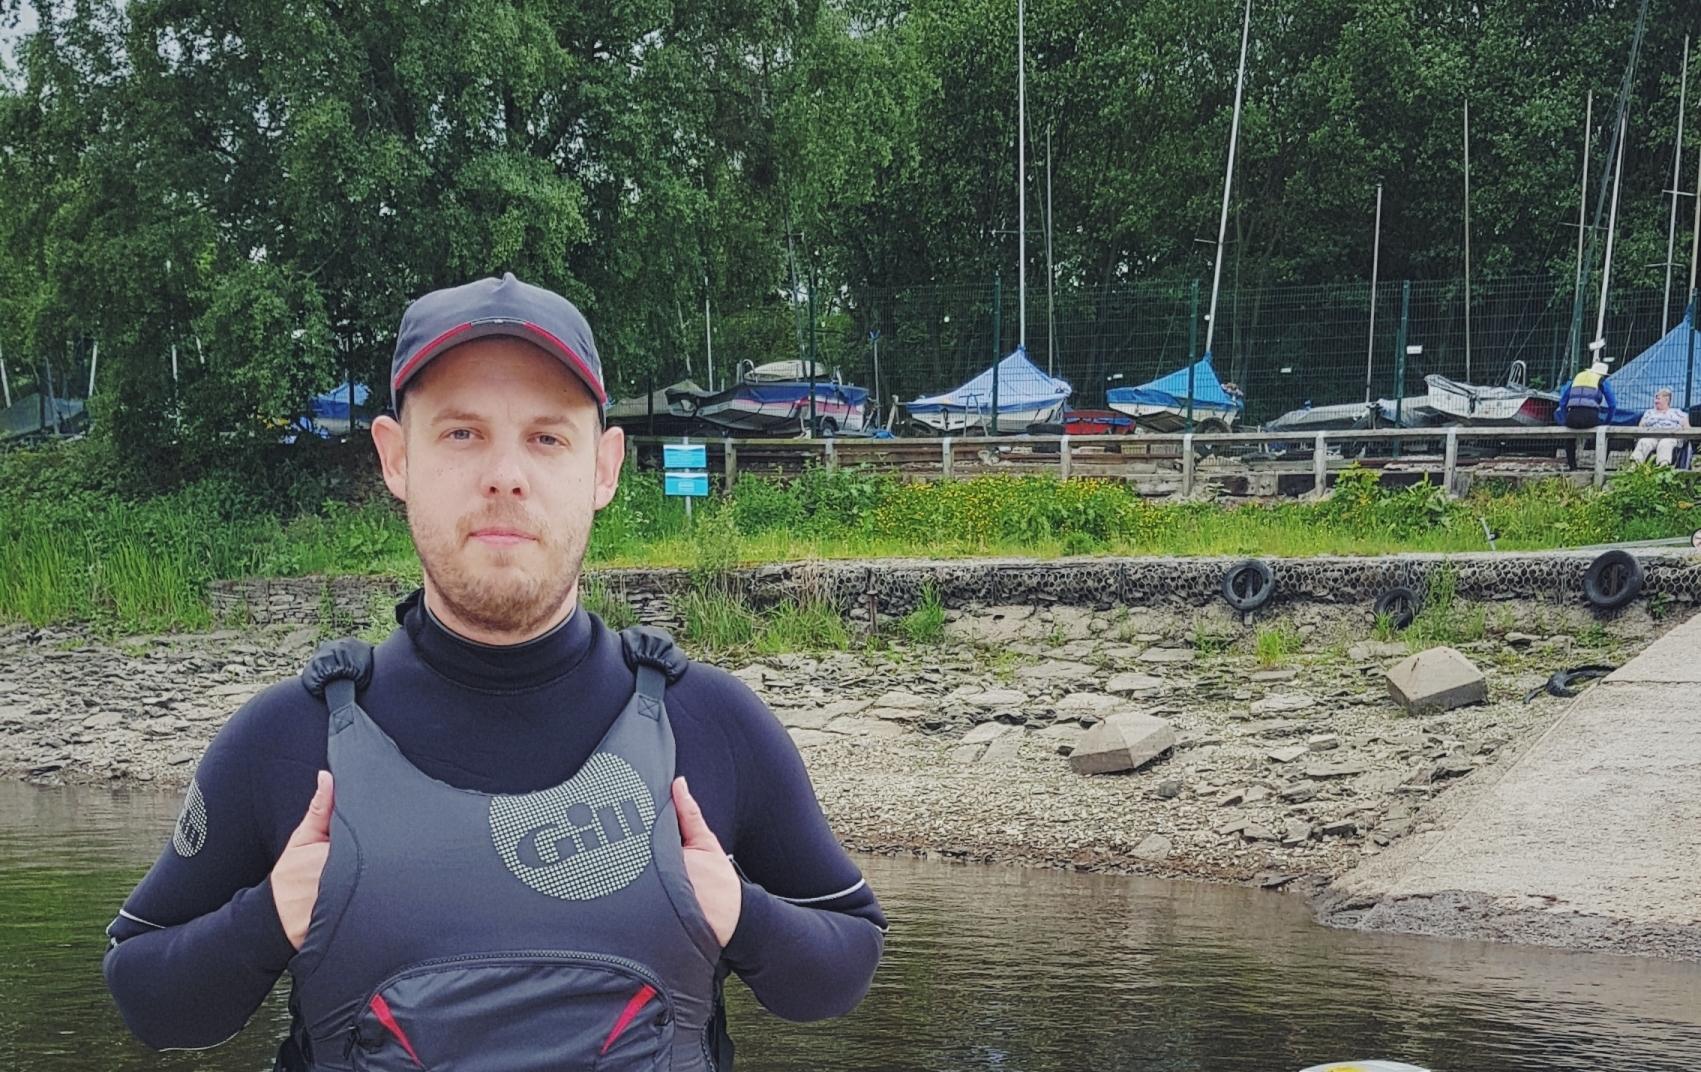 Plain sailing at Denholme for new recruit Jonathan